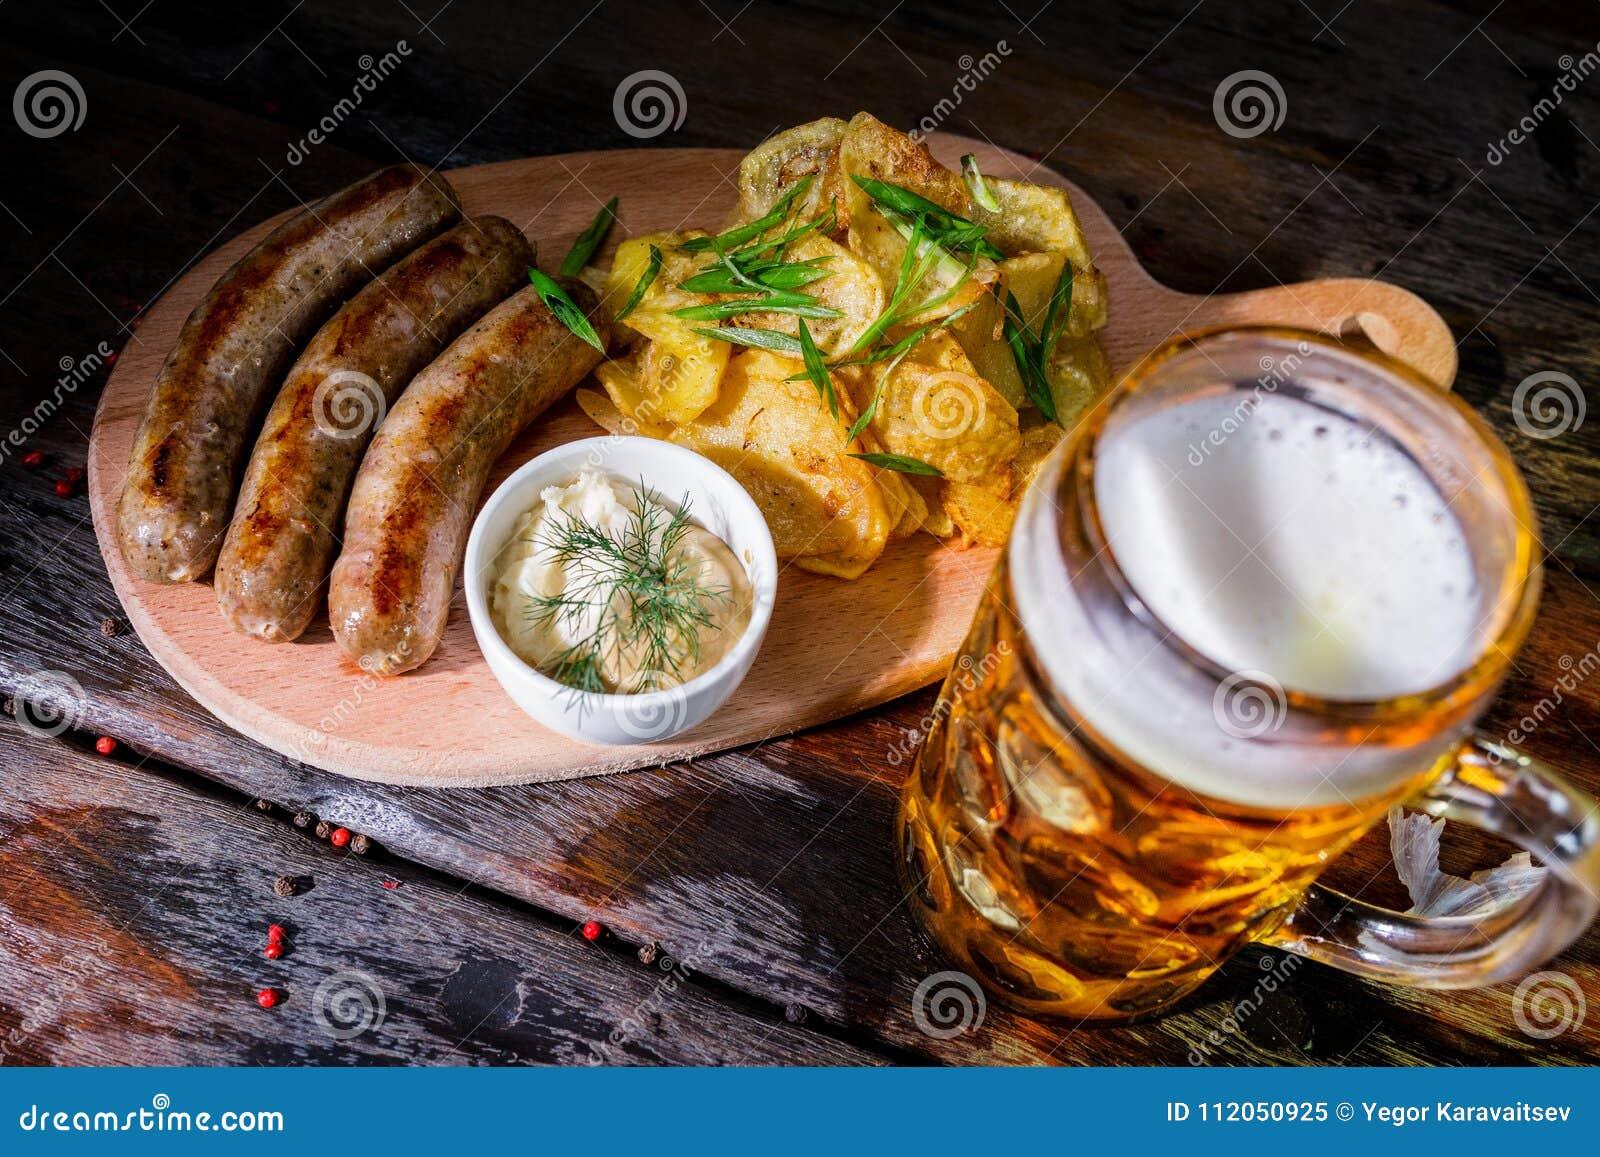 Assorted beer snacks with beer mug